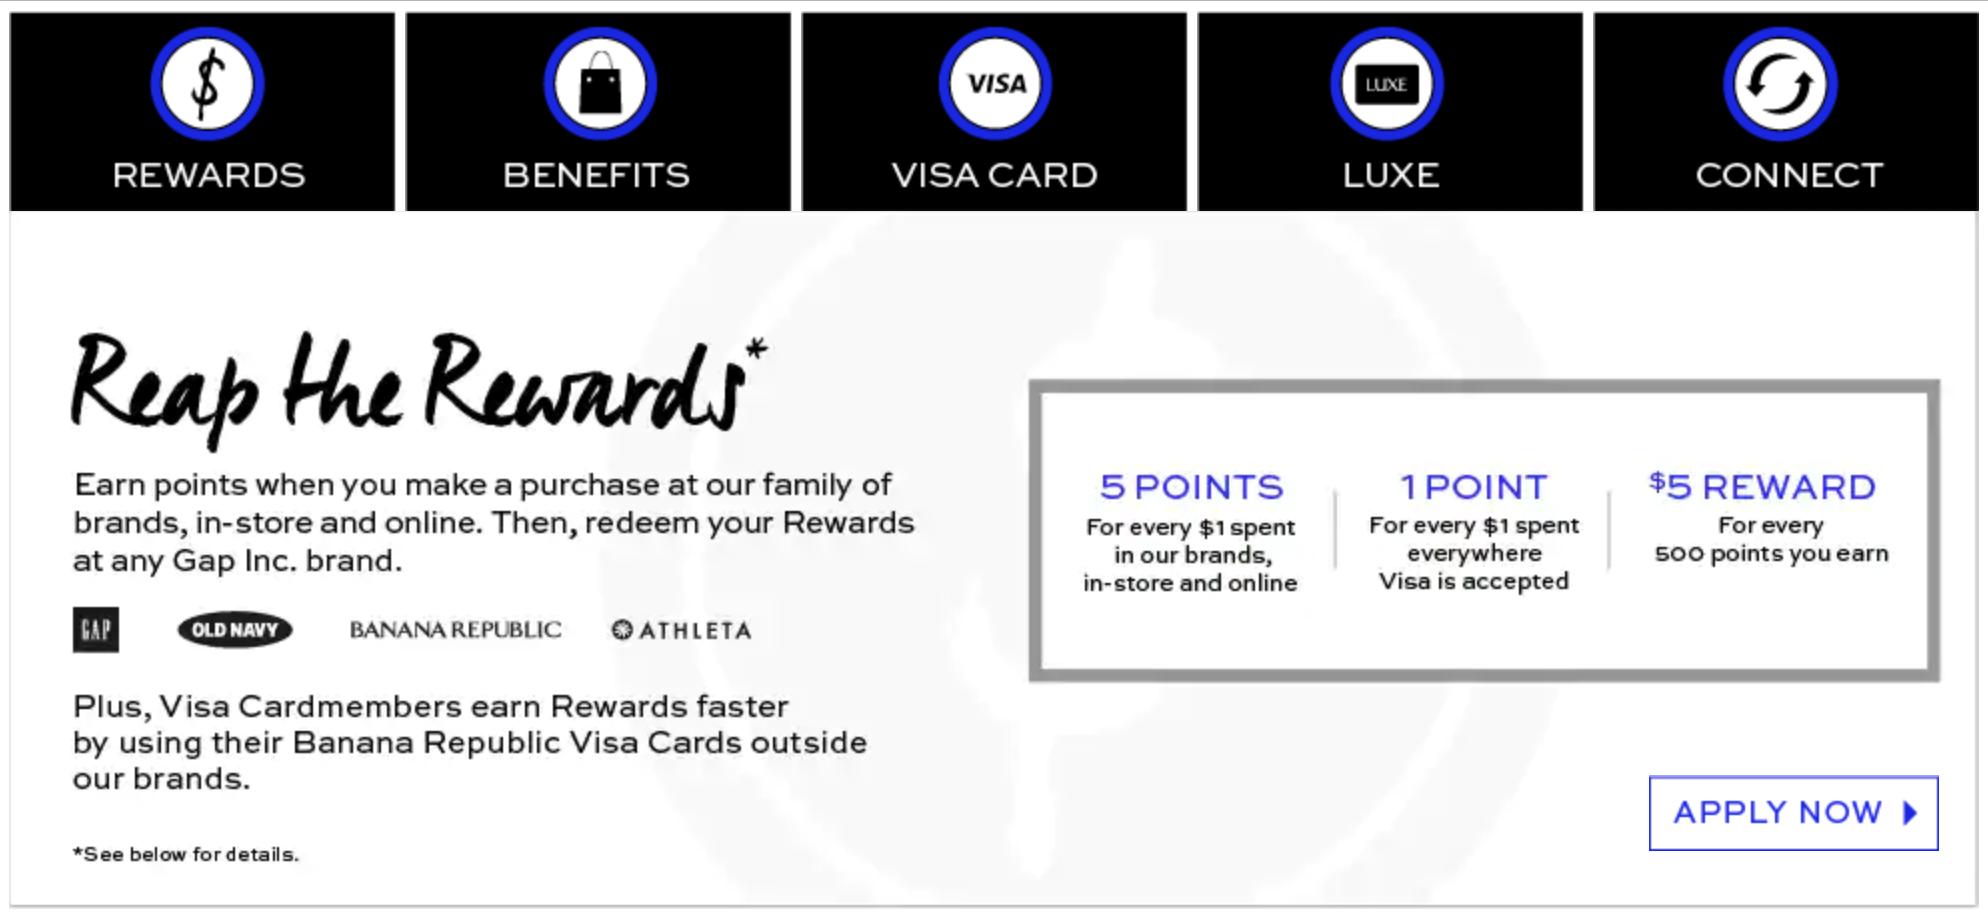 Banana Republic Credit Cards & Rewards - Worth It? 2020